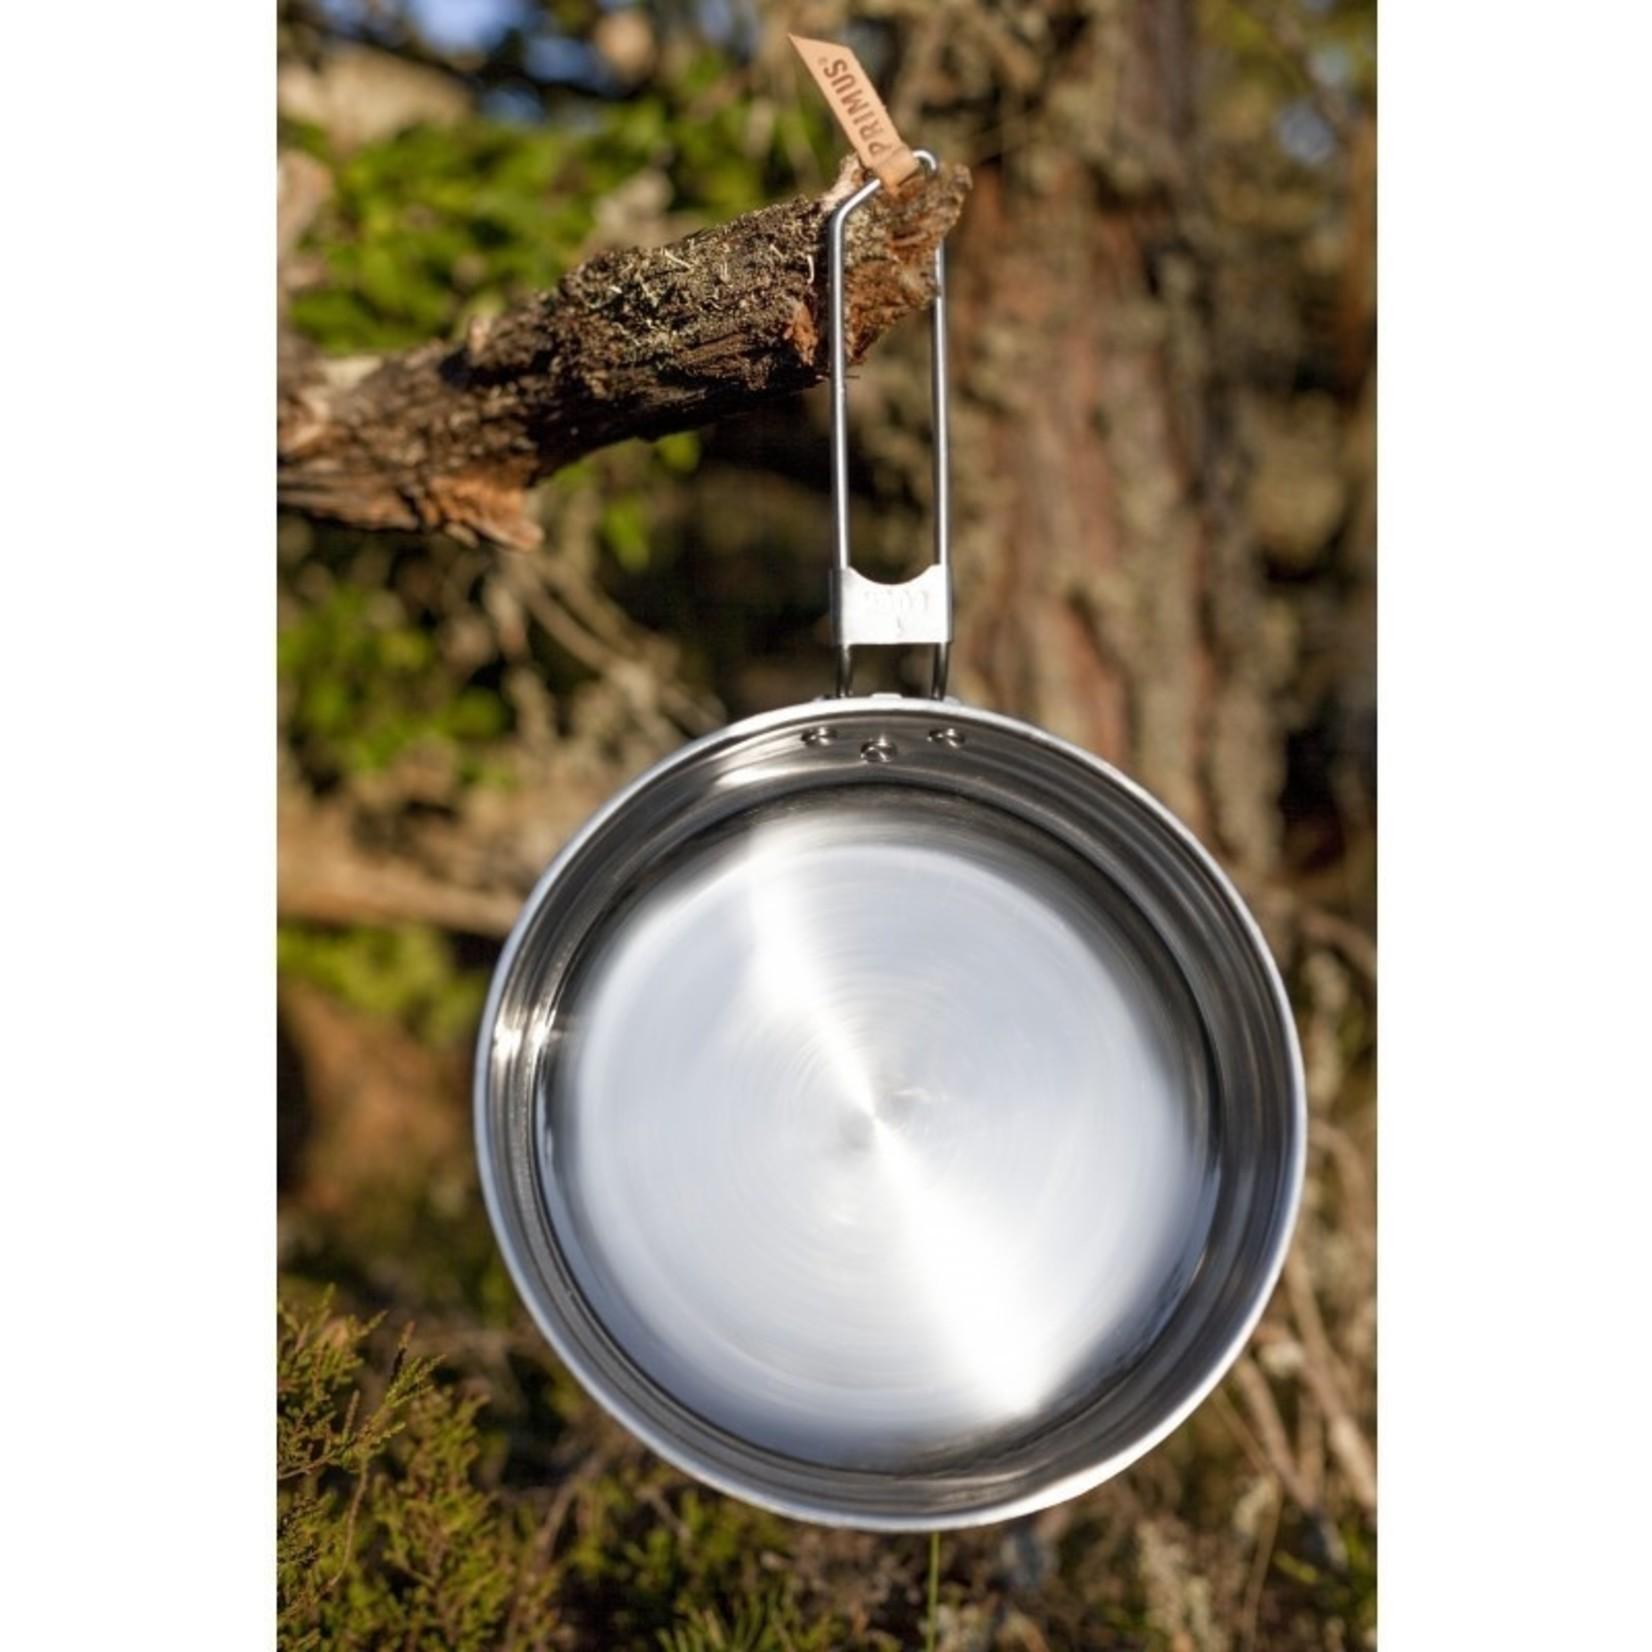 Primus Primus Campfire koekenpan 21 cm, BPA-vrij